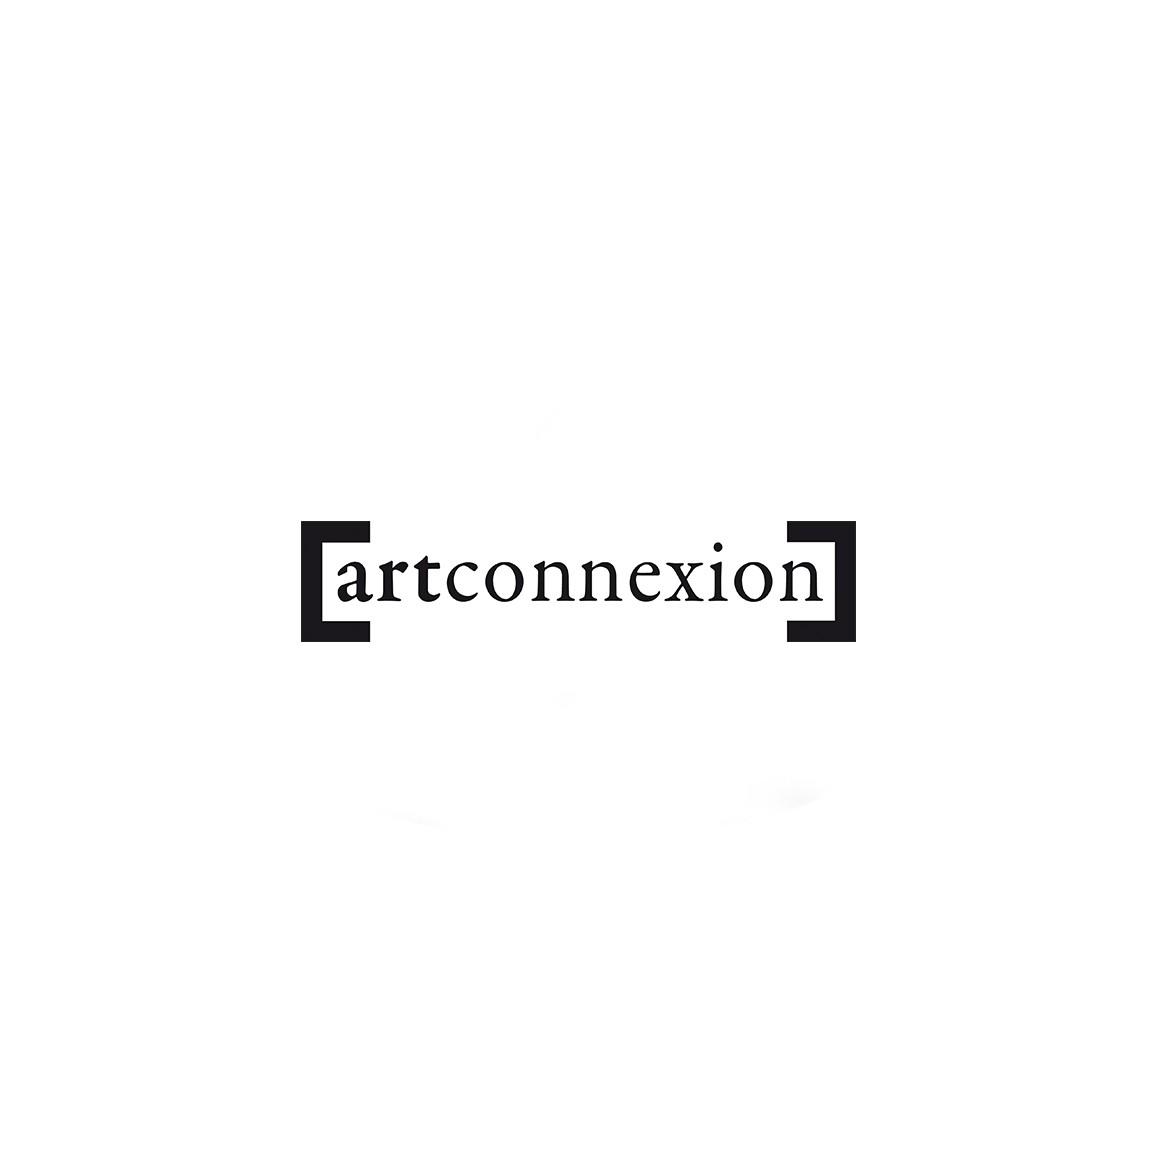 Artconnexion